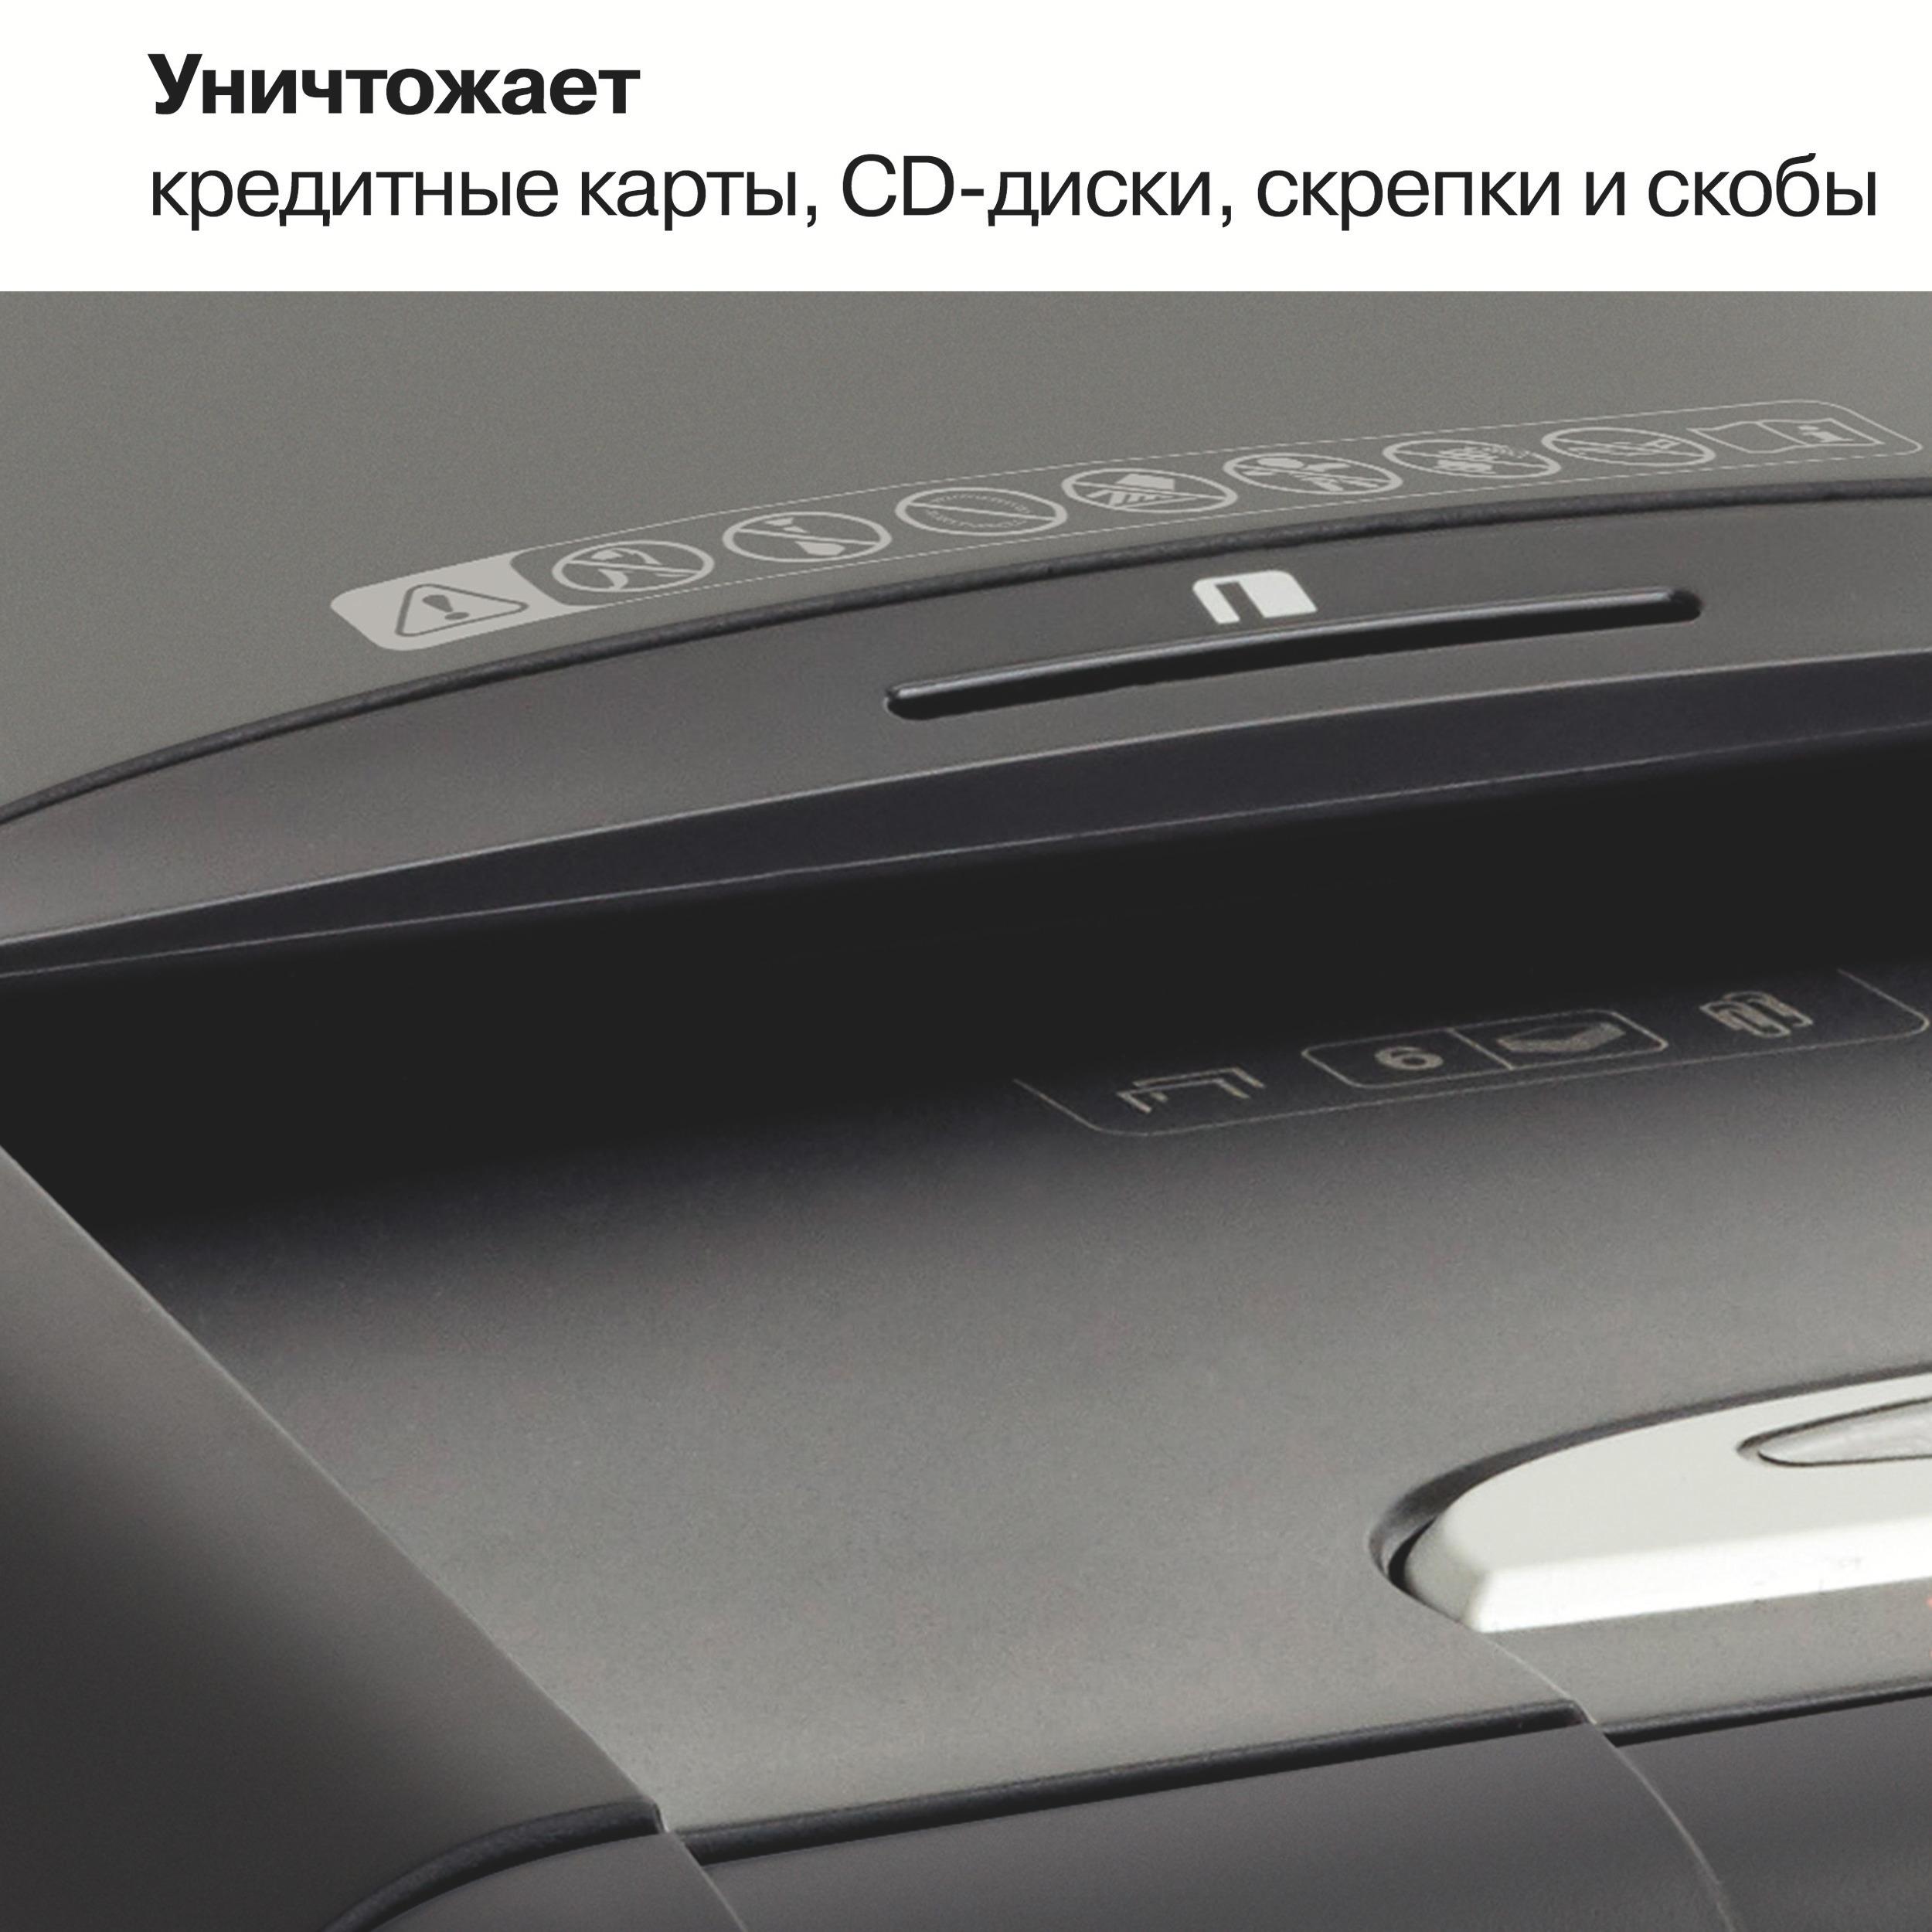 Уничтожитель документов Auto+ 130M. P5 6лист., микро-перекрестная резка, корзина 26л Rexel - фото 5